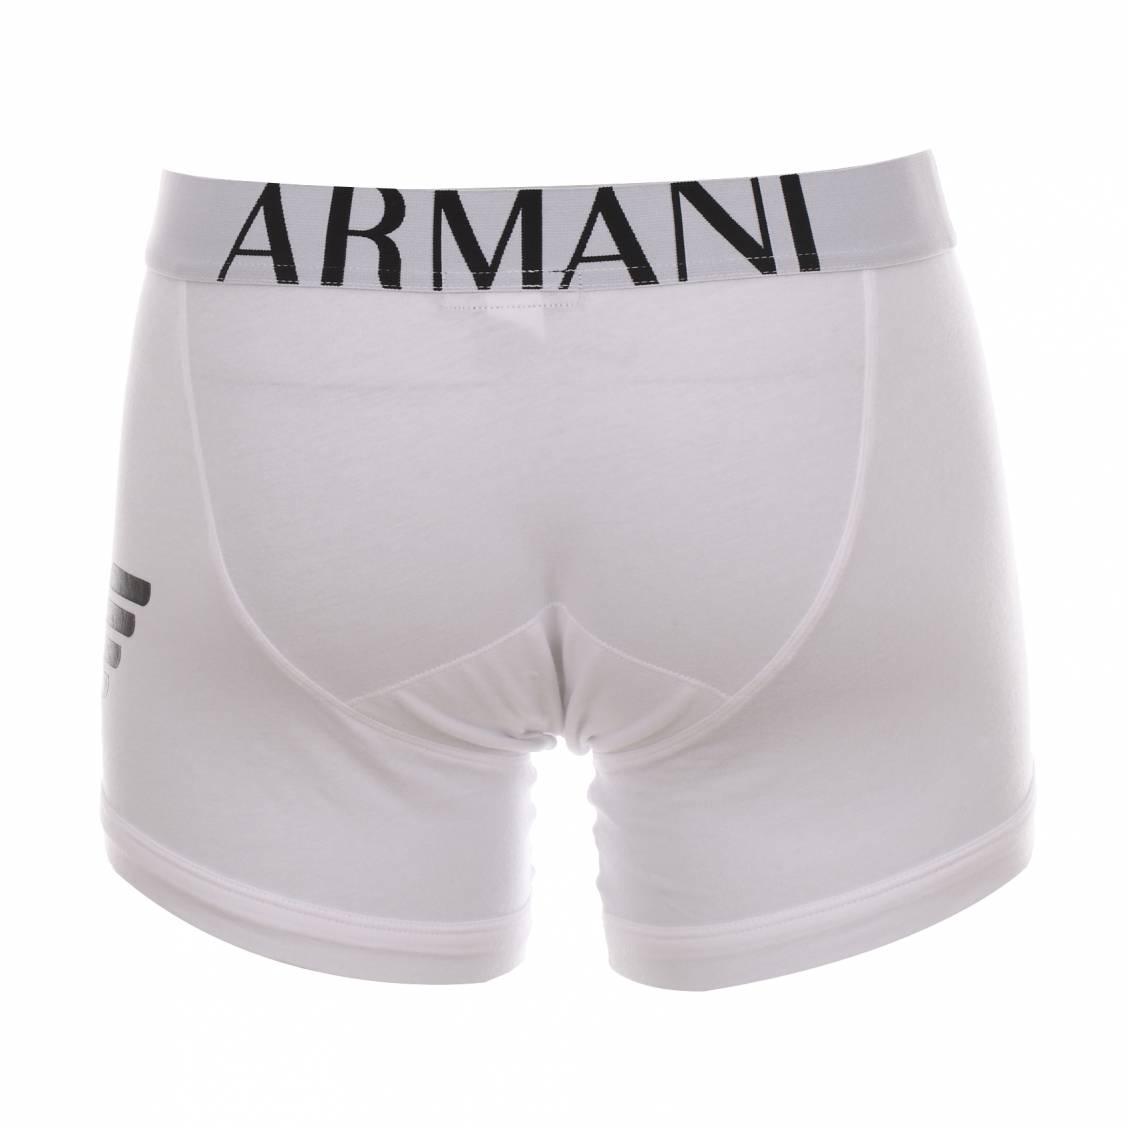 boxer long armani blanc estampillé en noir